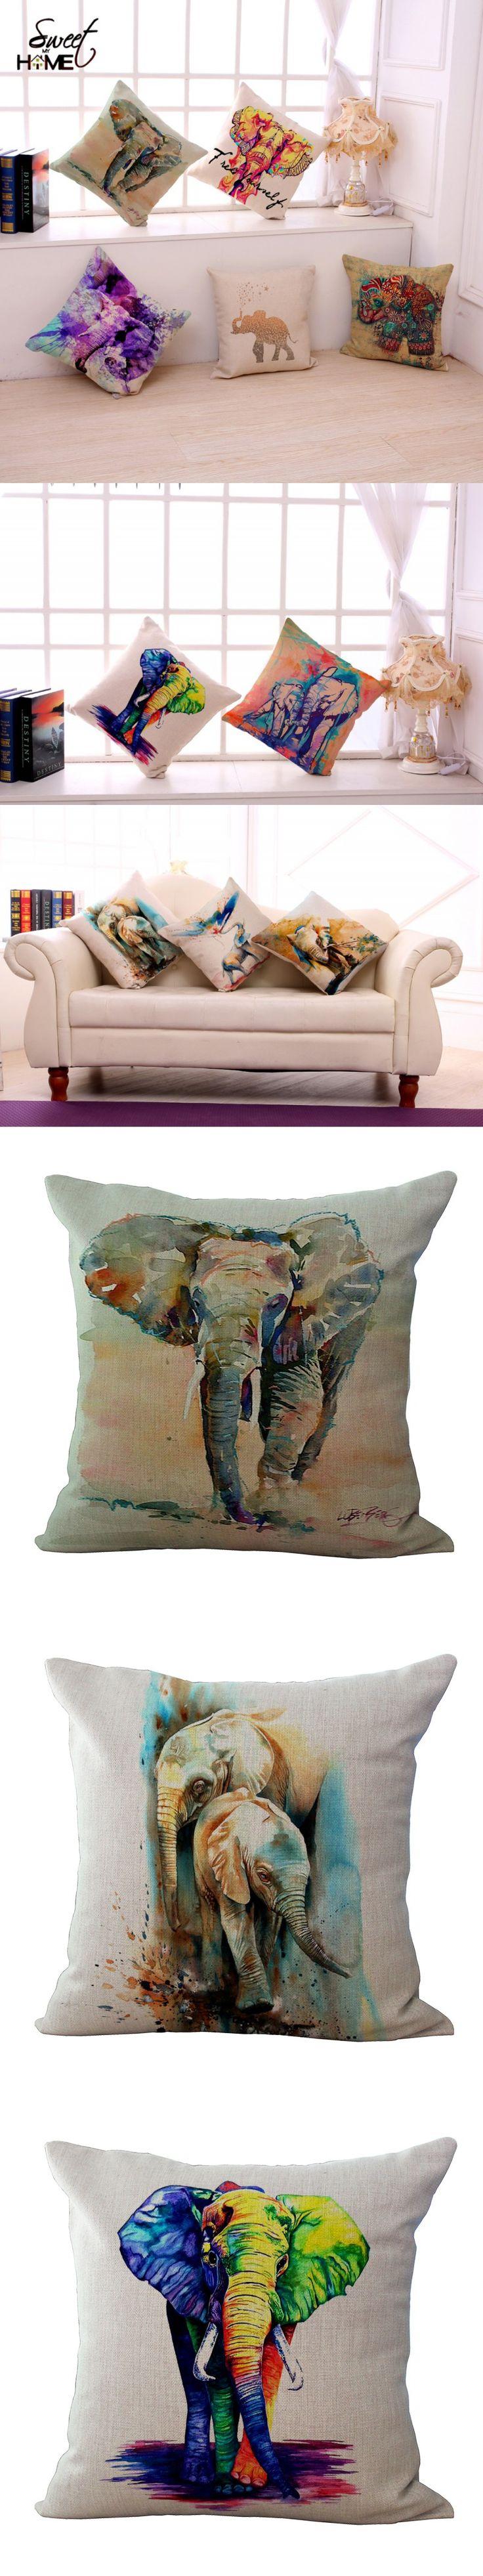 "Square 18"" Colorful Elephant Printed Modern Minimalist Cushion For Sofa Home Decorative Pillow Throw Almofadas Cojines $5.99"